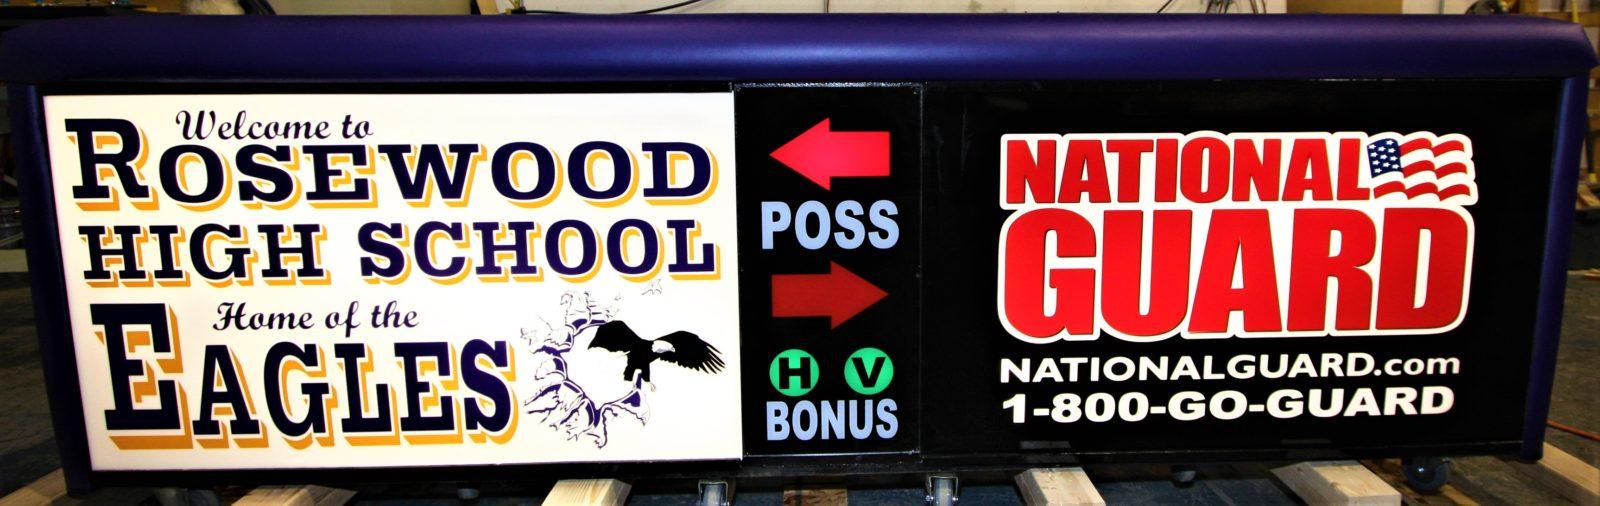 Rosewood high school scoring table North Carolina Army National Guard NCARNG